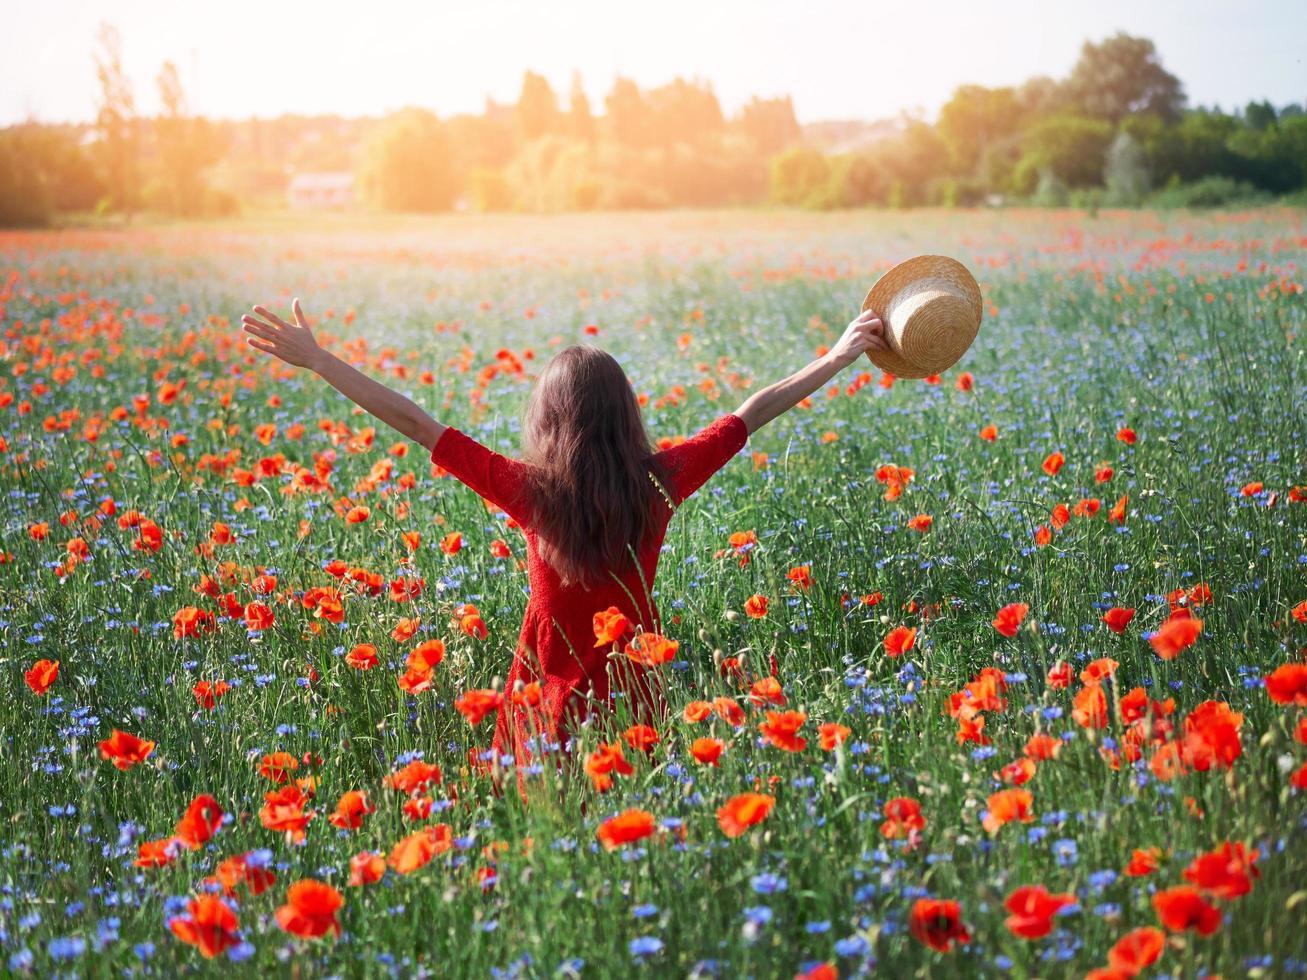 junge schöne Frau mit erhobenen Armen im Frühlingsmohnfeld foto